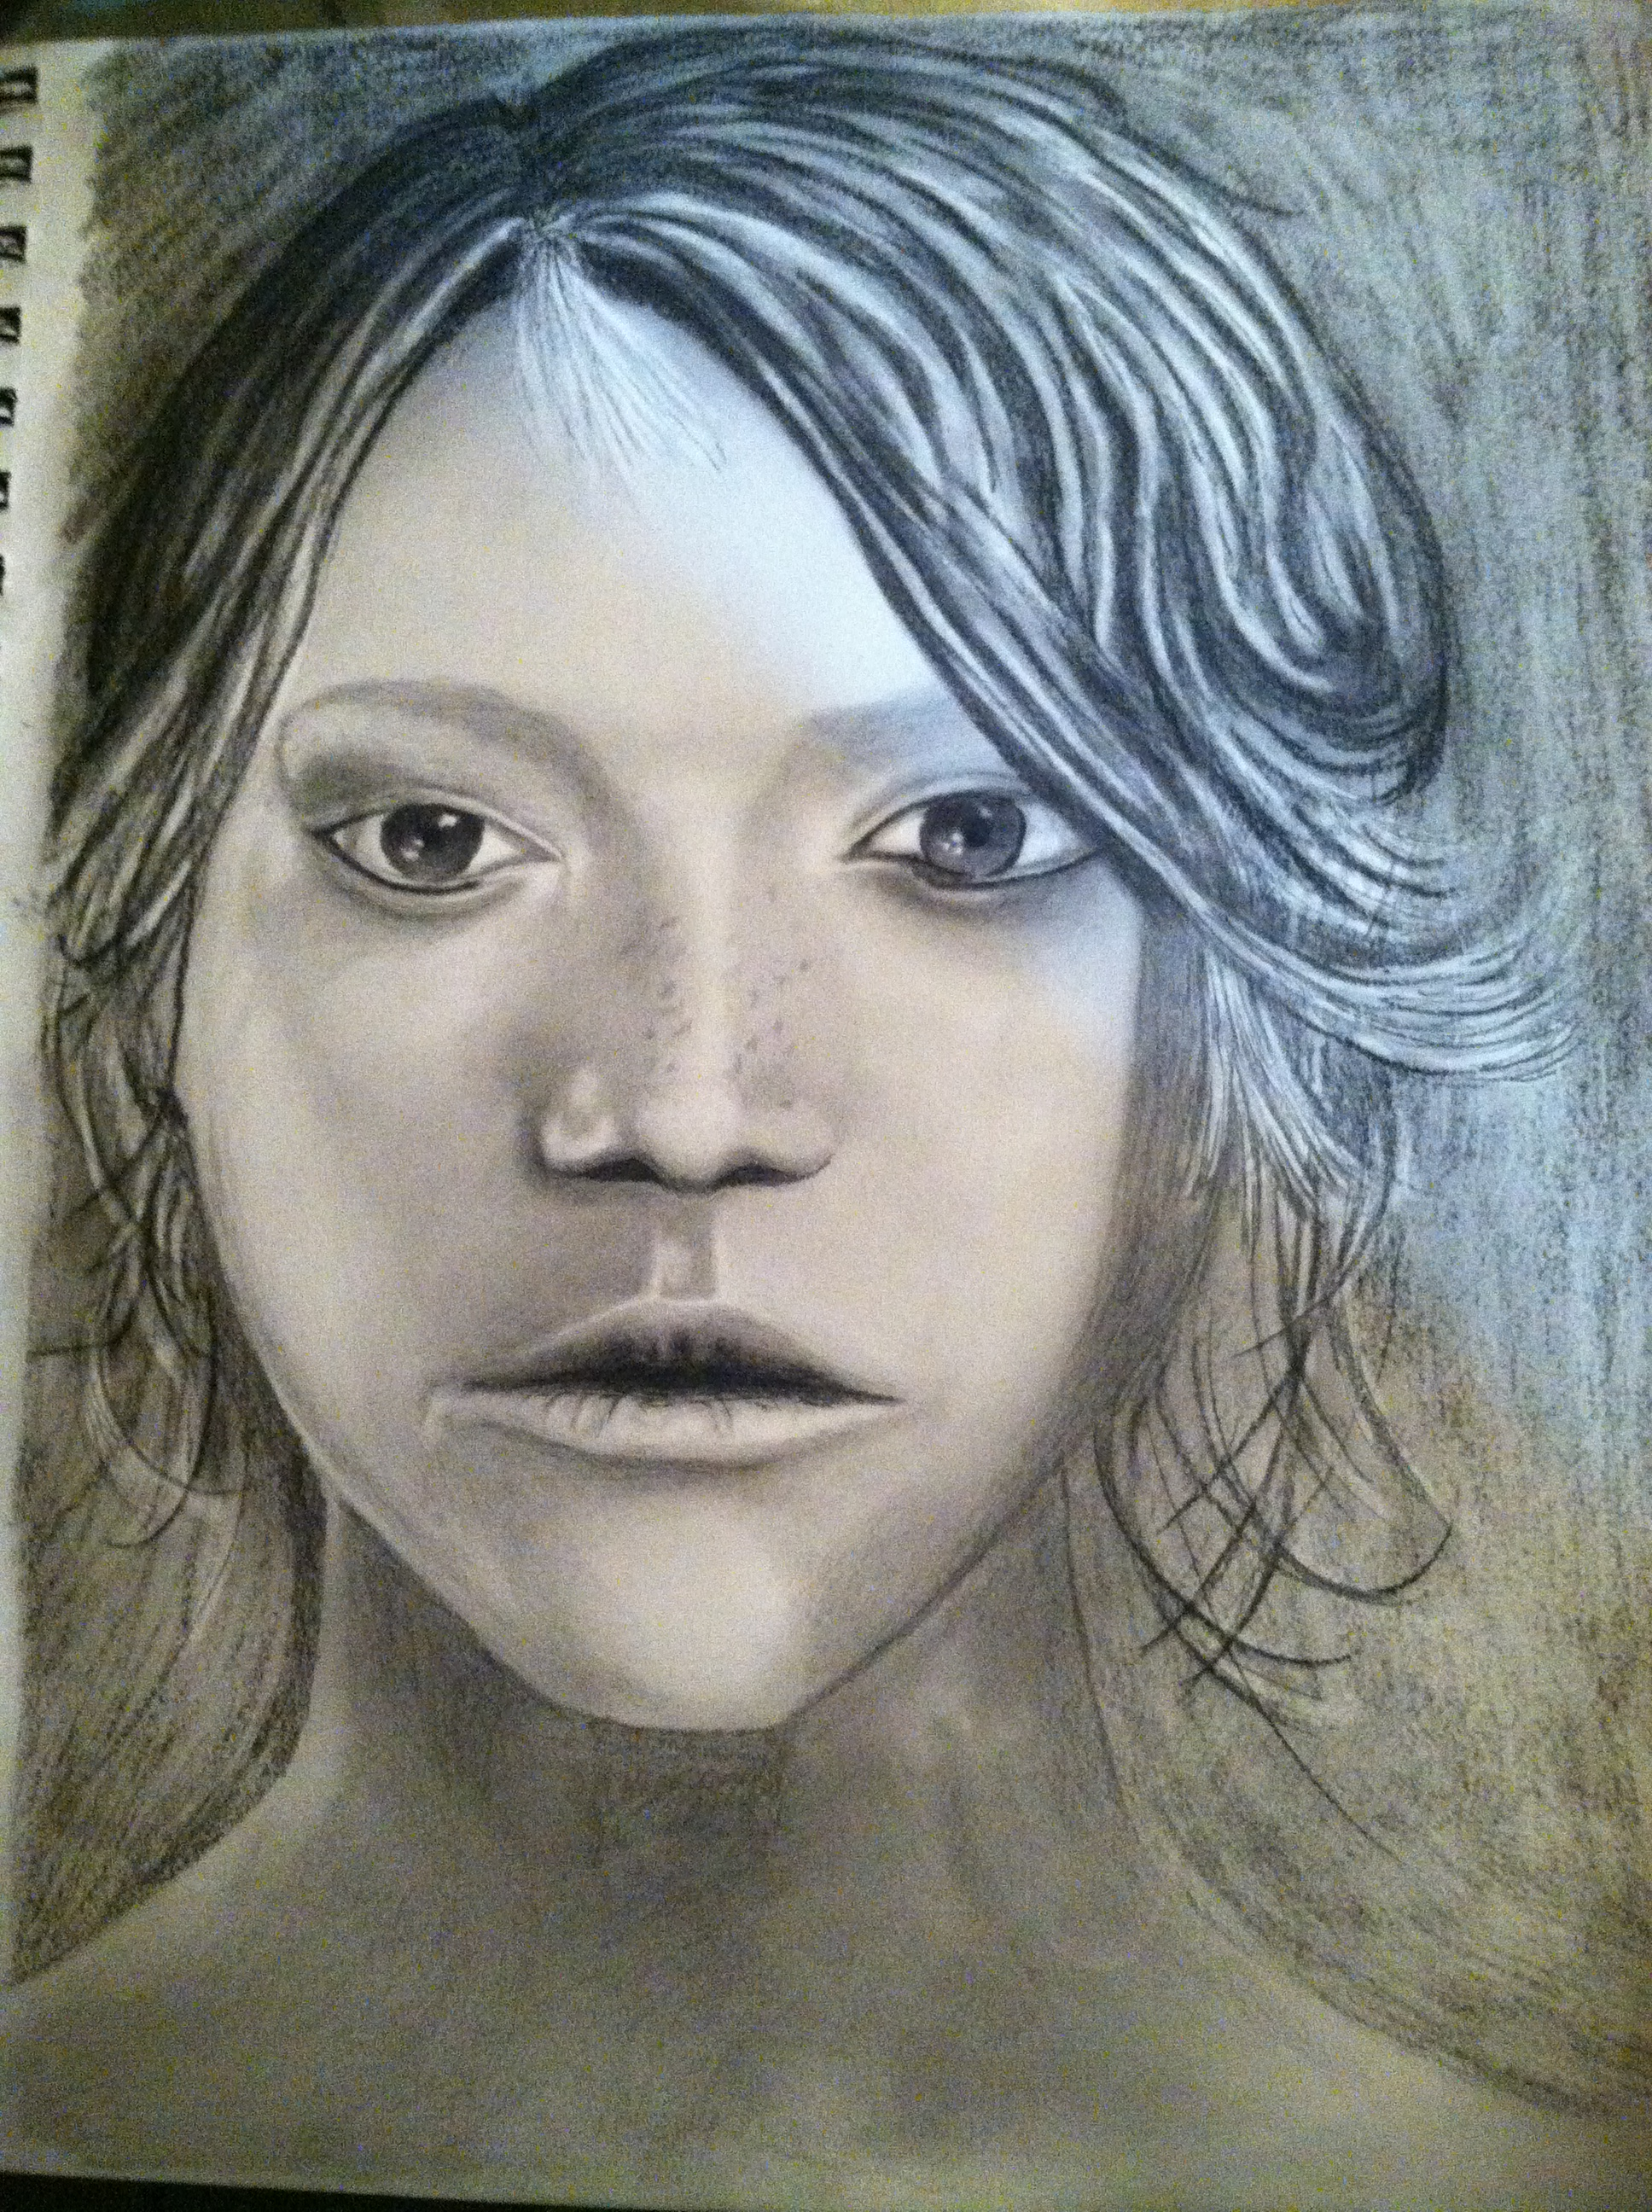 Girl by wdriii